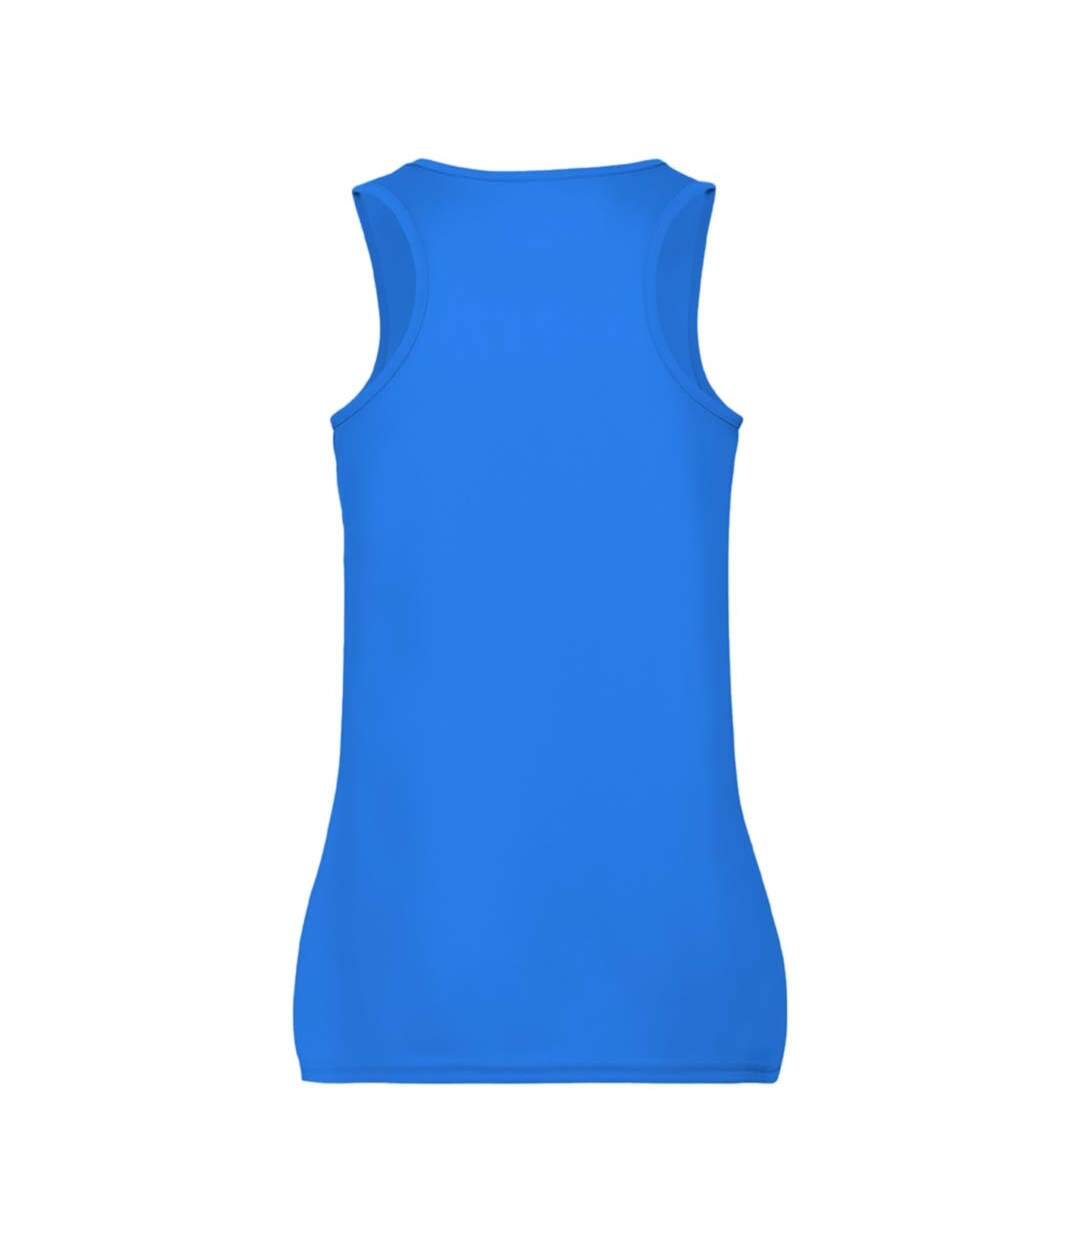 Fruit Of The Loom Mens Moisture Wicking Performance Vest Top (Royal Blue) - UTRW4705